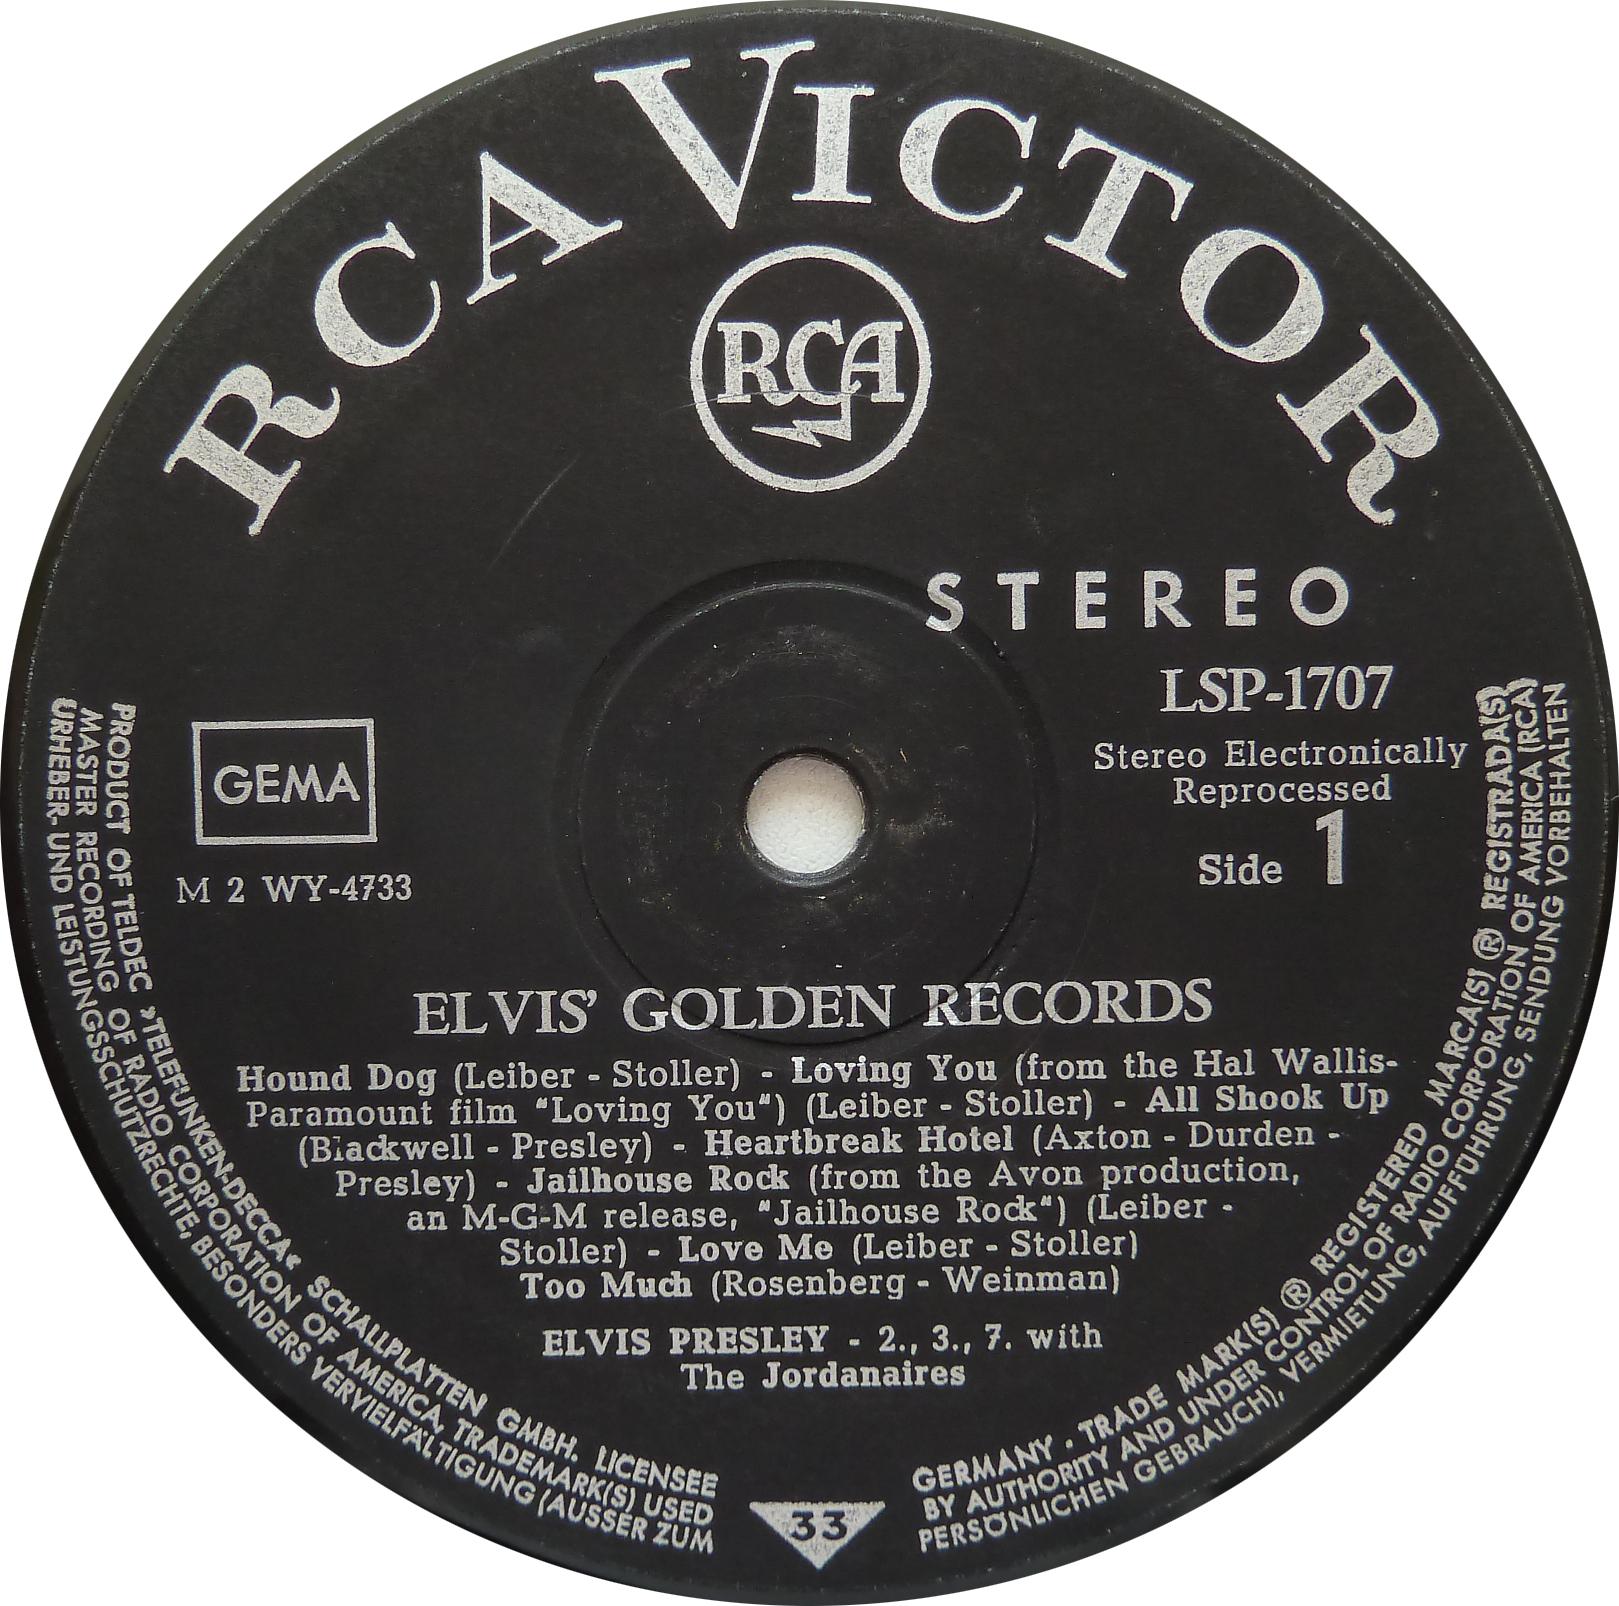 ELVIS' GOLDEN RECORDS Elvisgoldenrecords66awvlo6